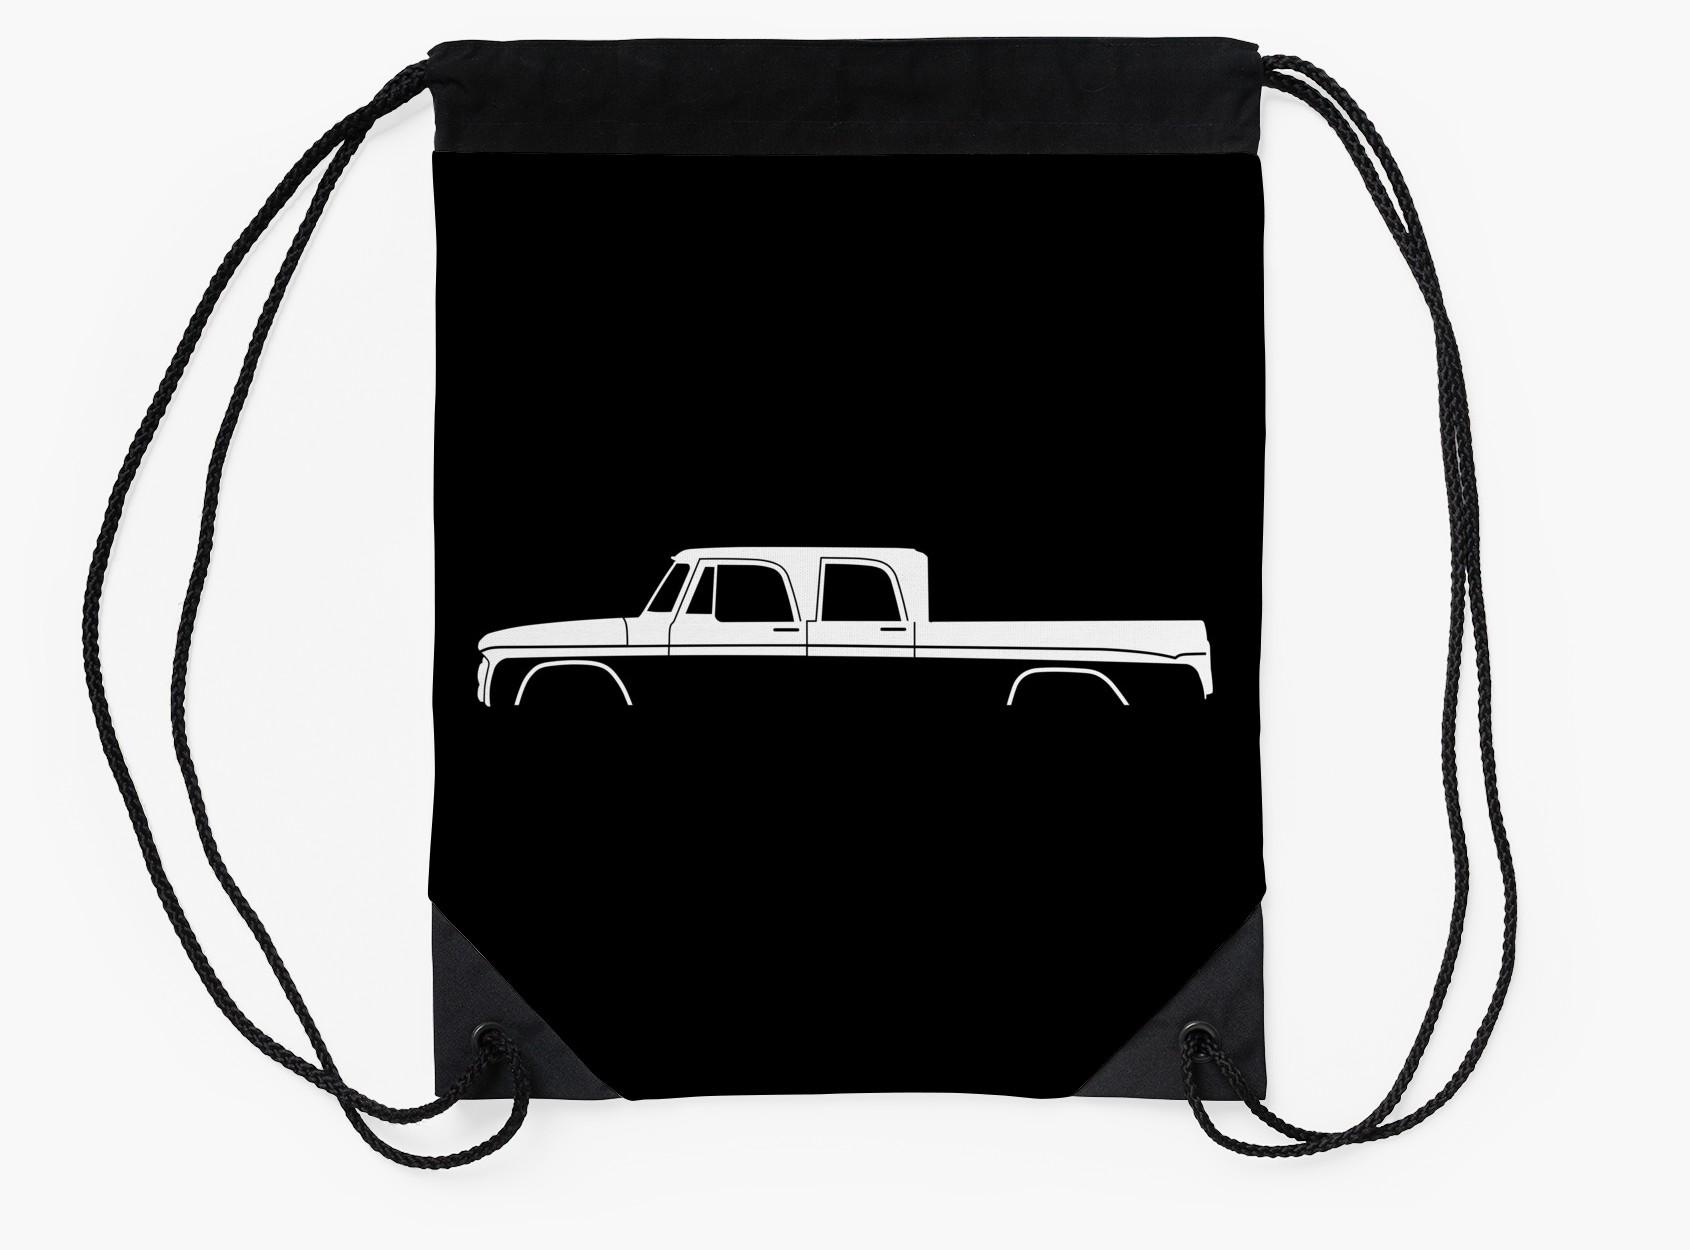 1690x1250 Truck Silhouette